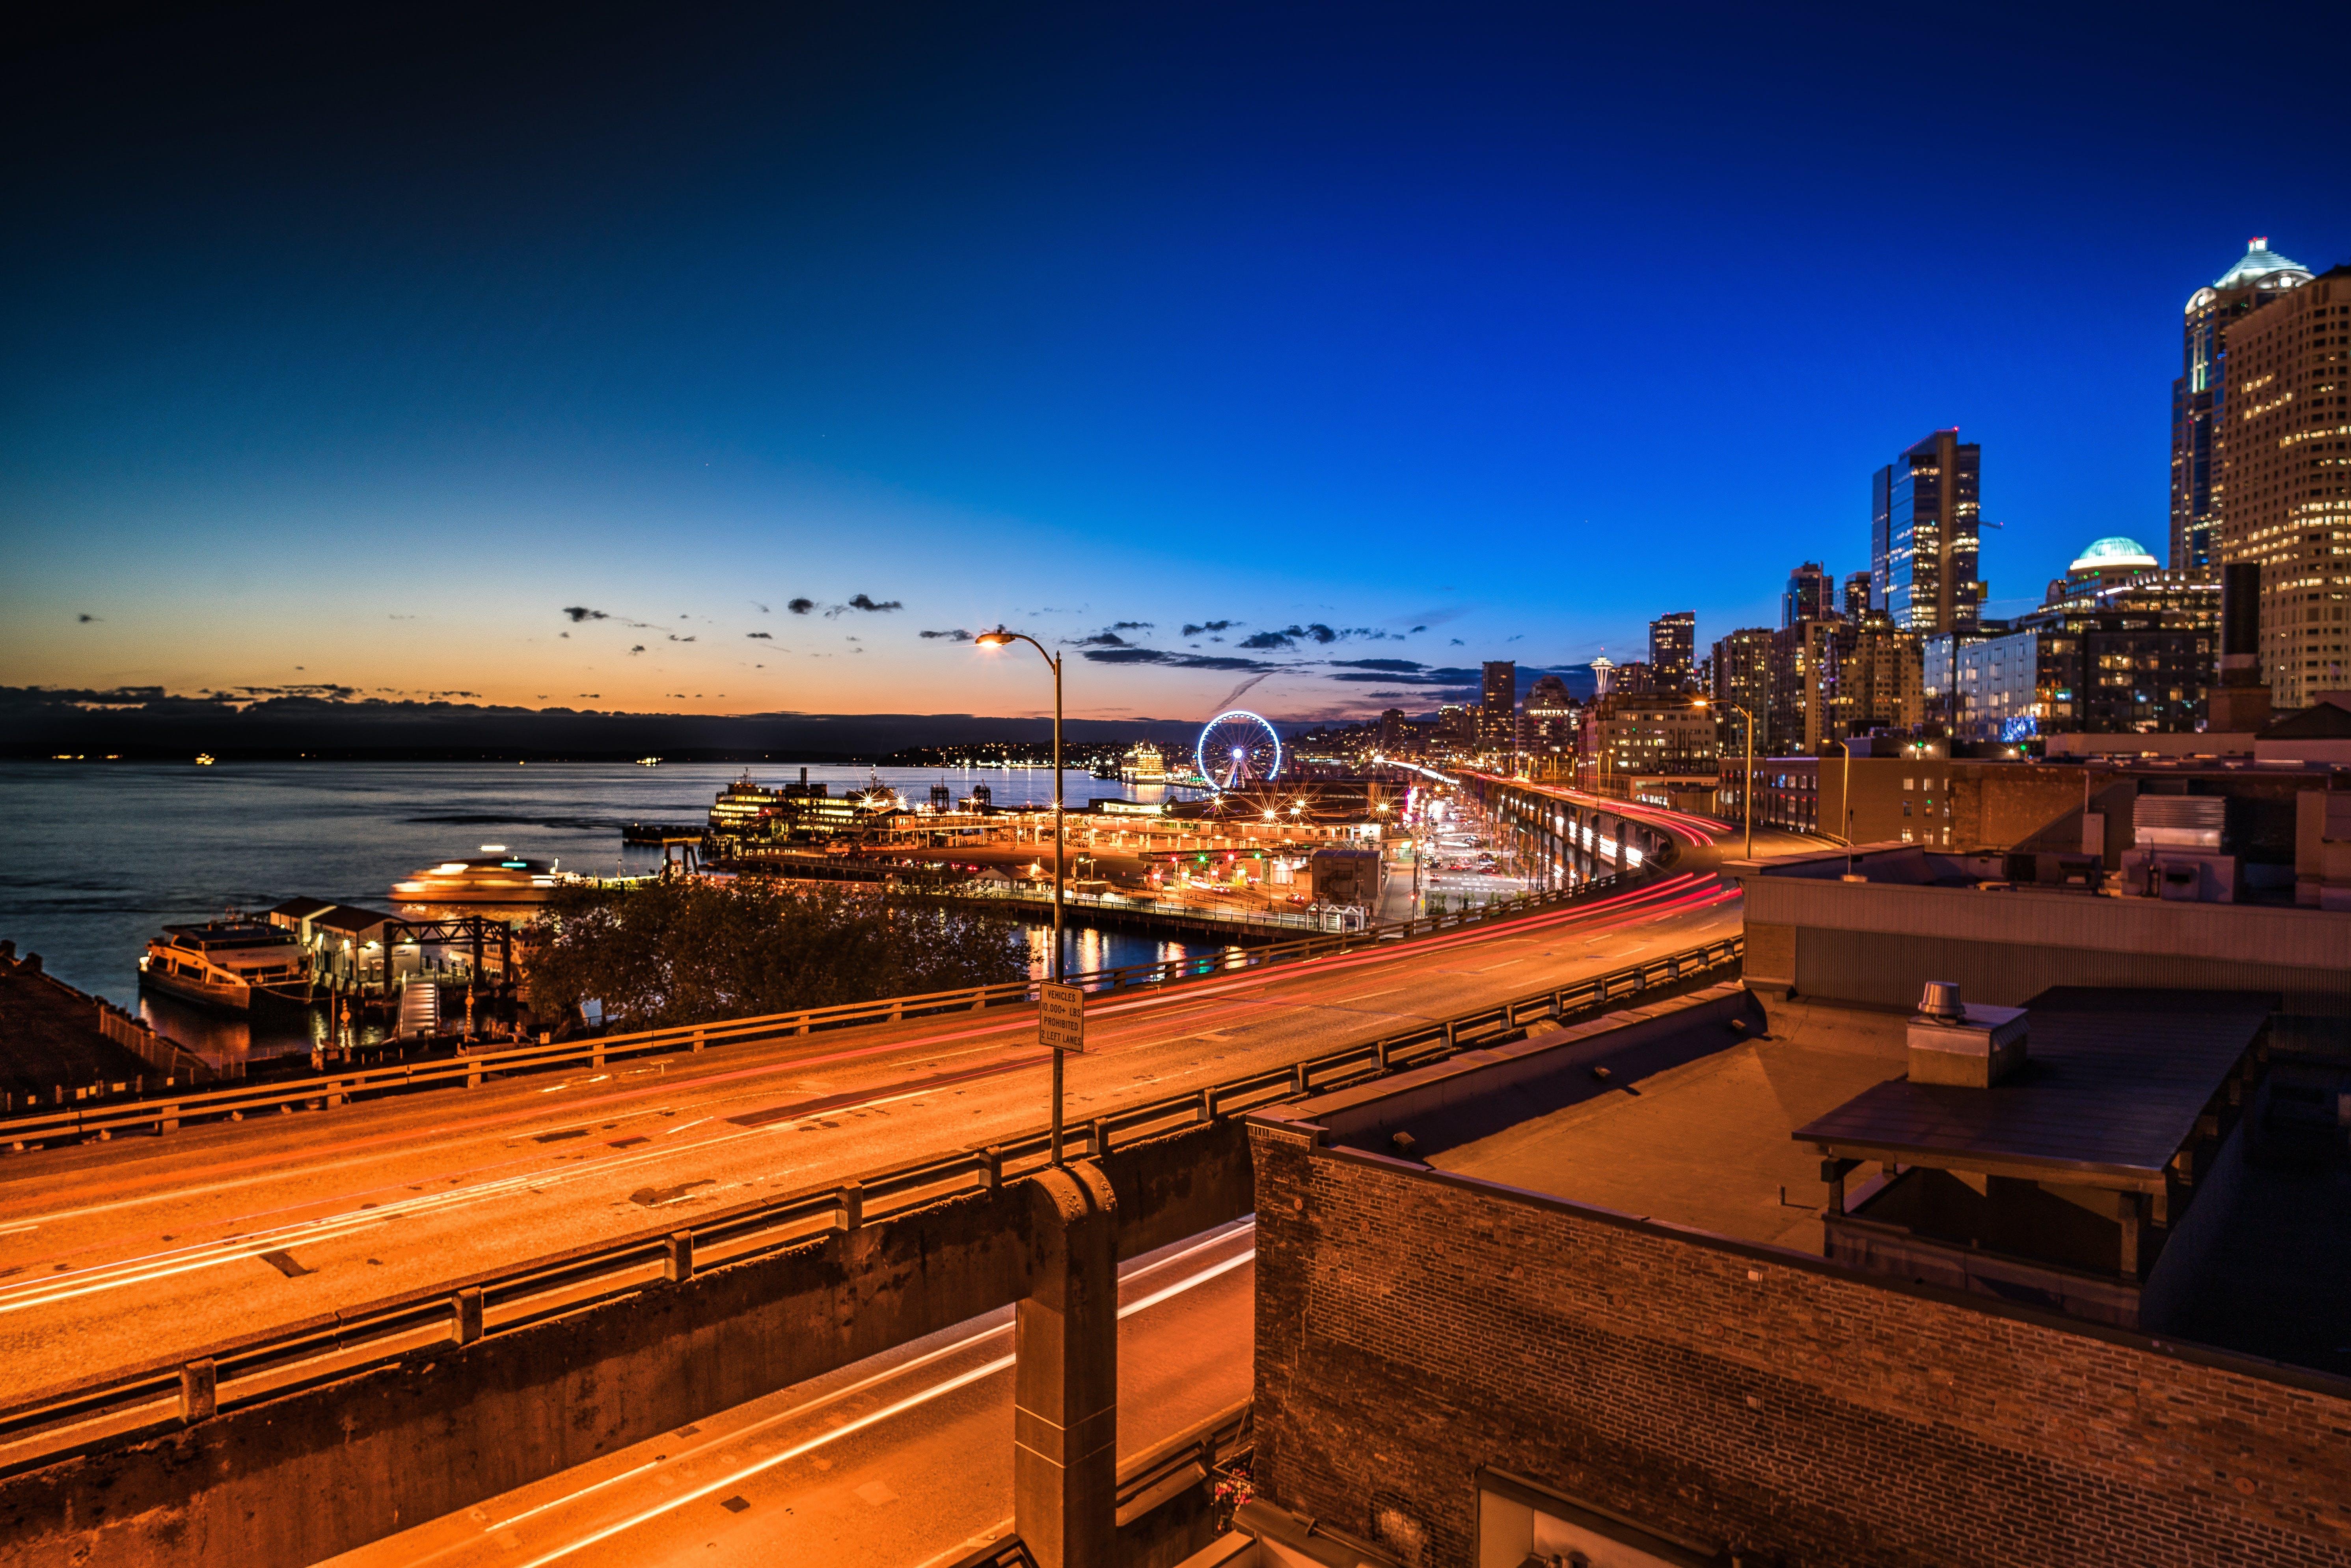 Illuminated City during Golden Hour